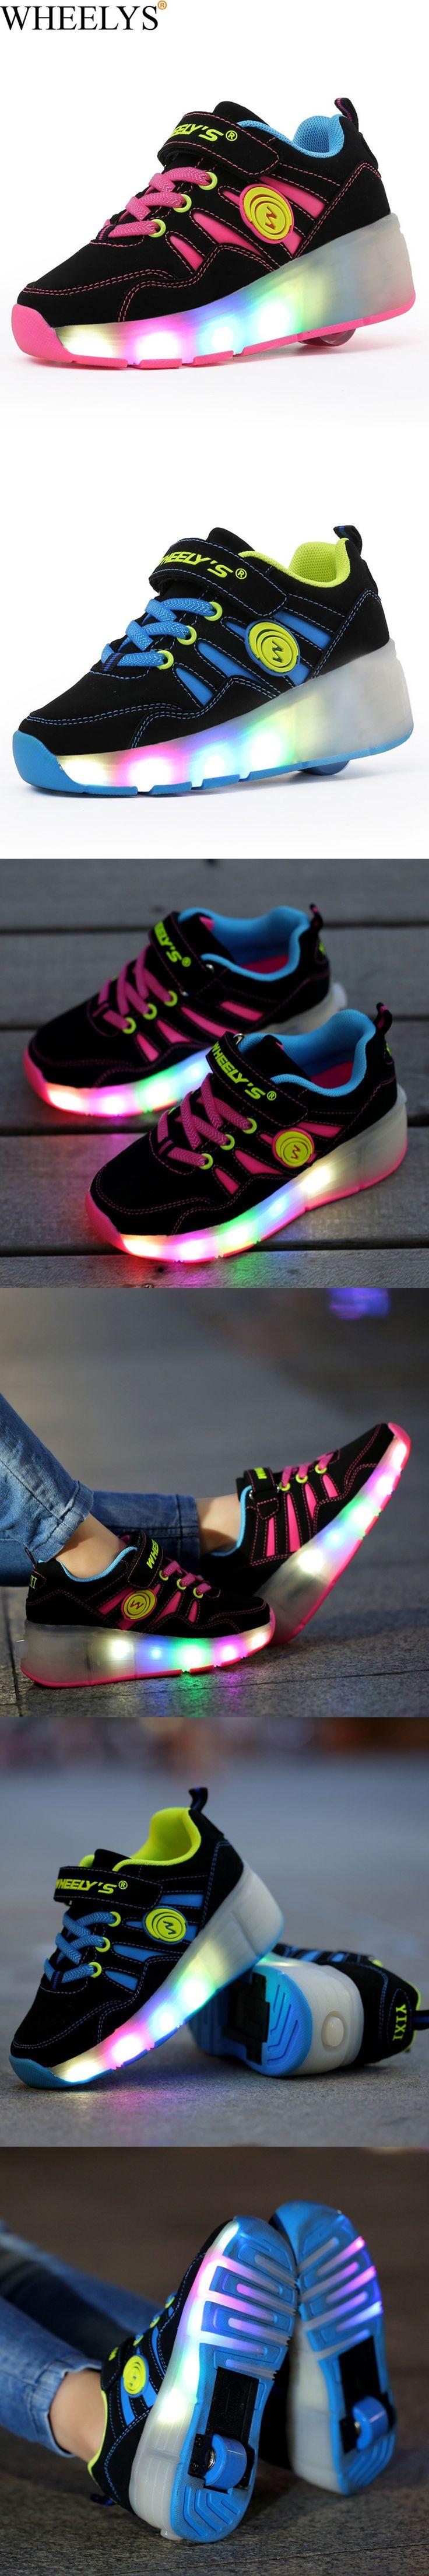 2016 New Summer Breathable Child shoes WHEELYS Girls Boys LED Light Roller Skate Shoes For Children Kids Sneakers With Wheels $23.52